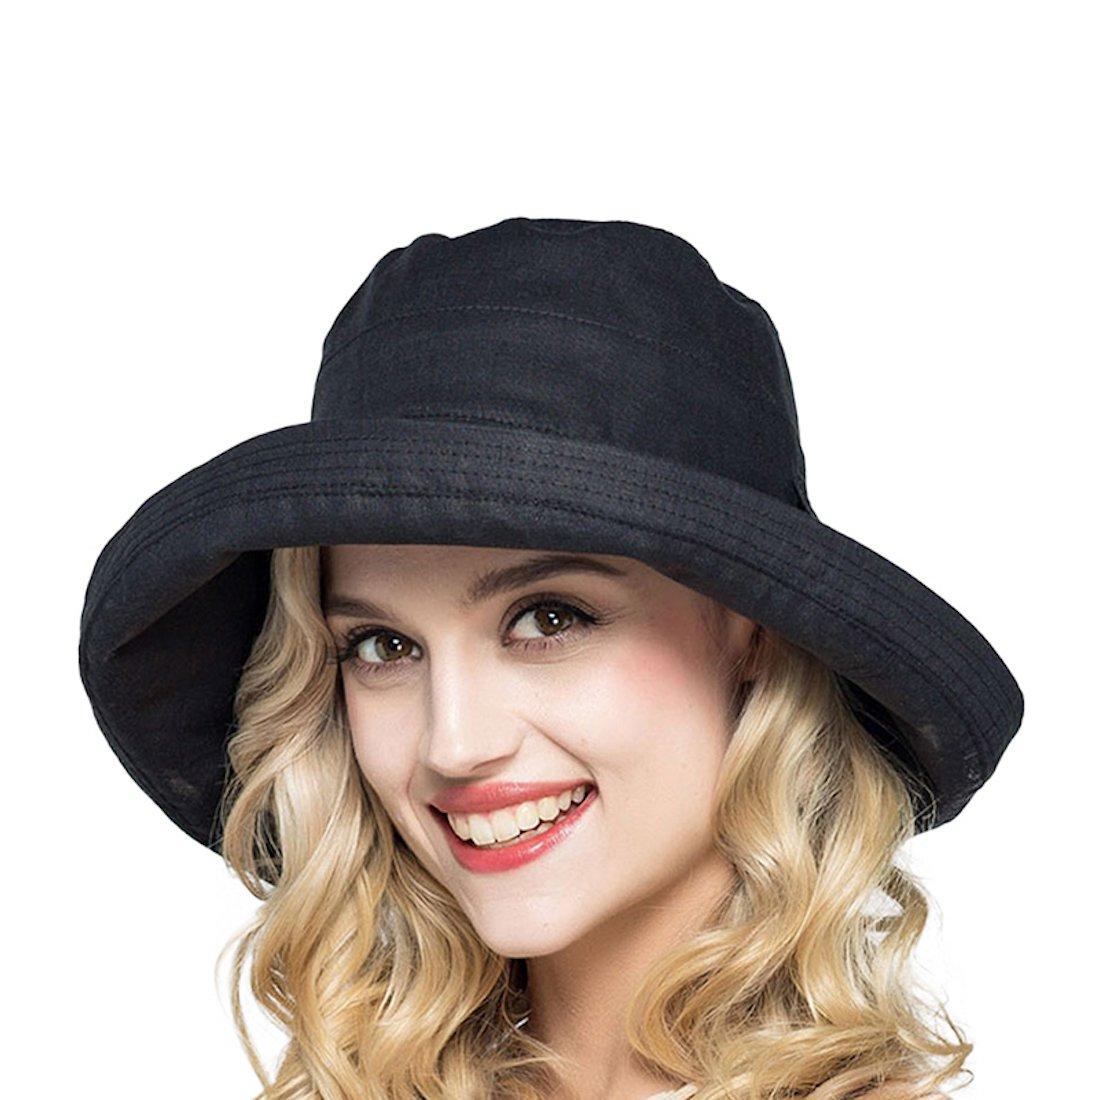 LLmoway Women Safari Sun Hat UPF50 Roll Up Cotton Wide Brim Floppy Foldable Beach Hat with Bow Black